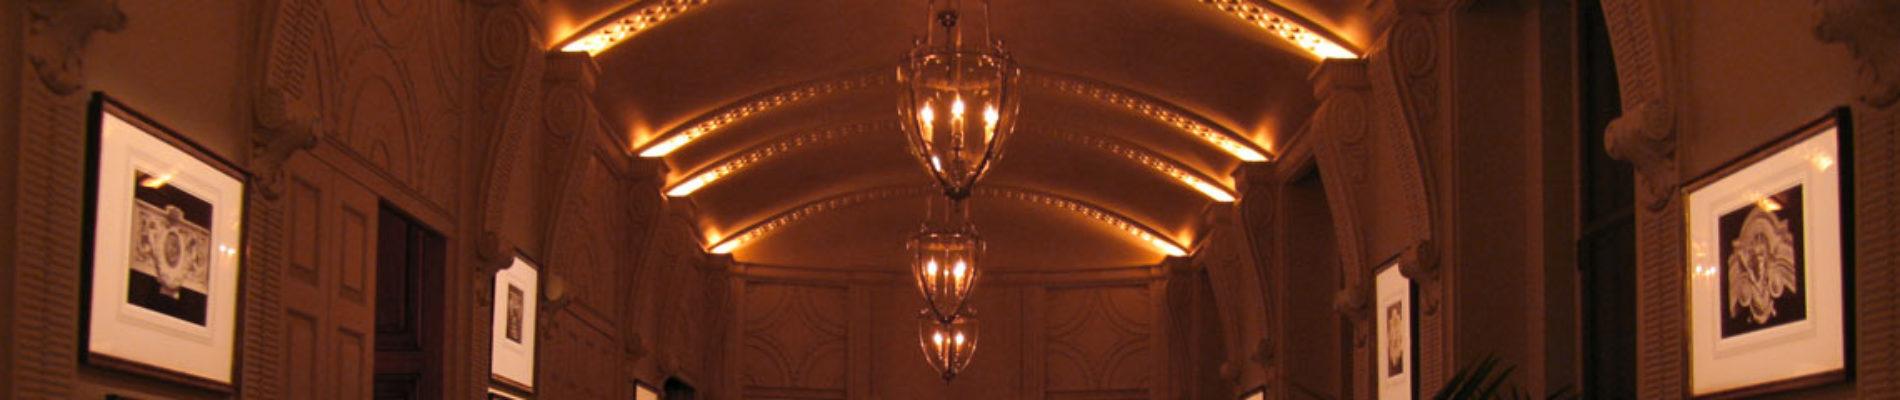 Antique Cabinet Lighting Houston | Illuminations Lighting Design